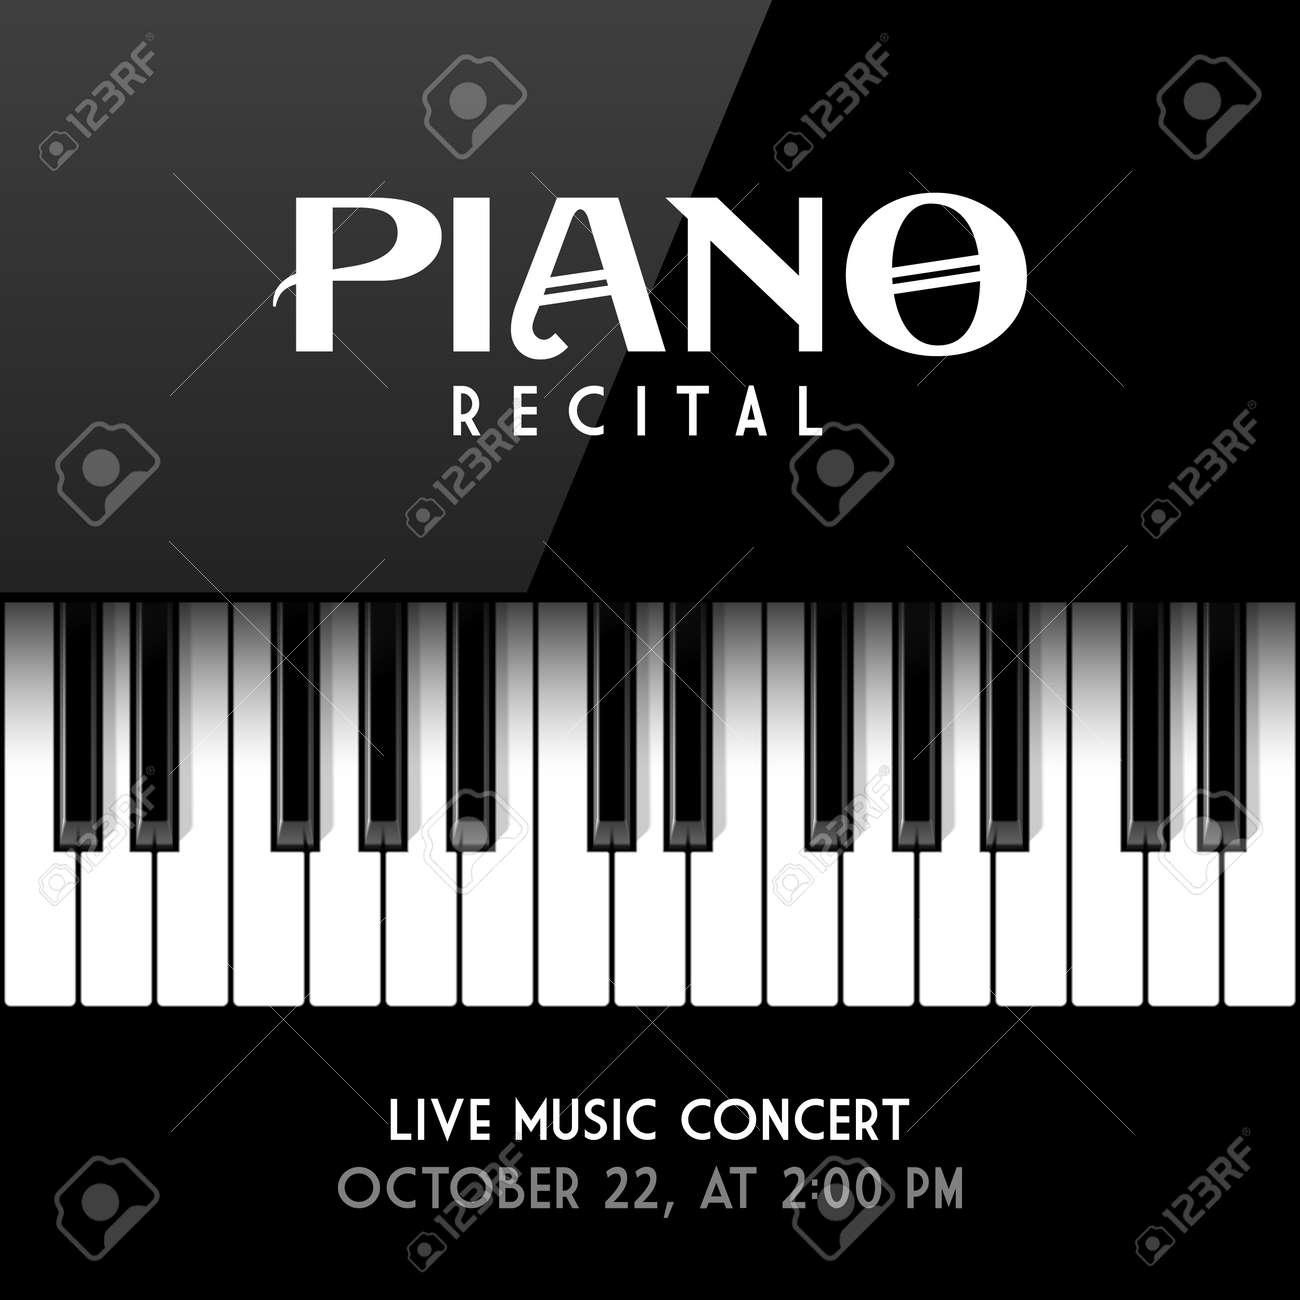 Piano Recital Poster Leaflet Or Invitation Design Template Stock Vector